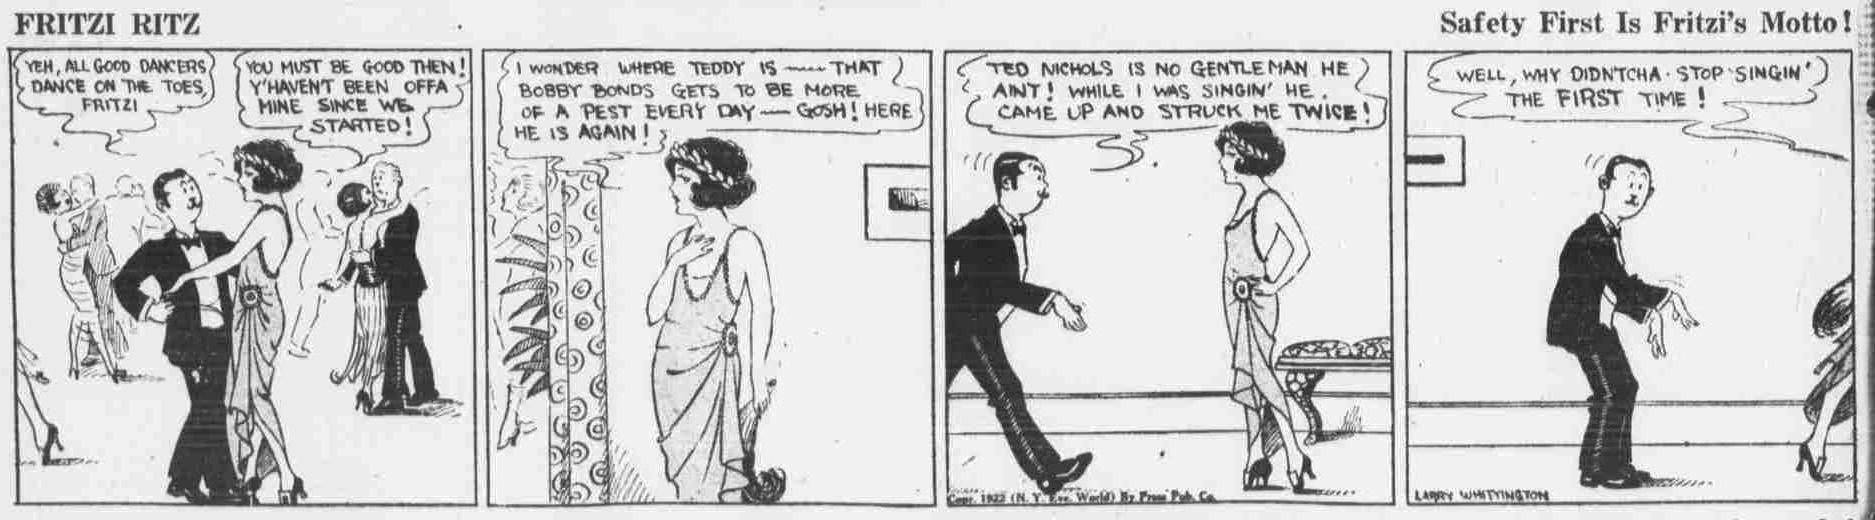 Nov. 20, 1922